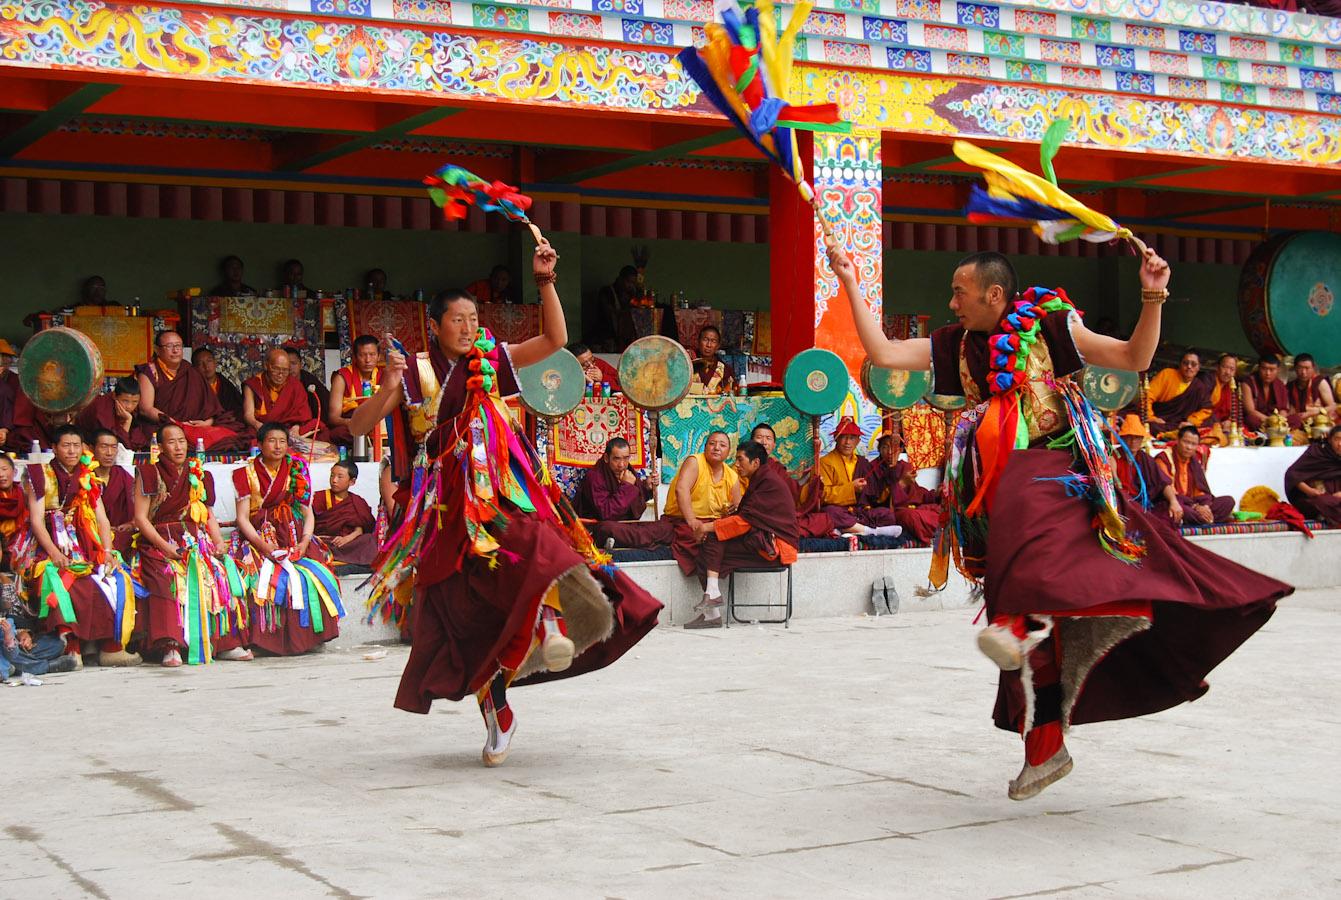 Cham, la danza sacra dei monaci tibetani